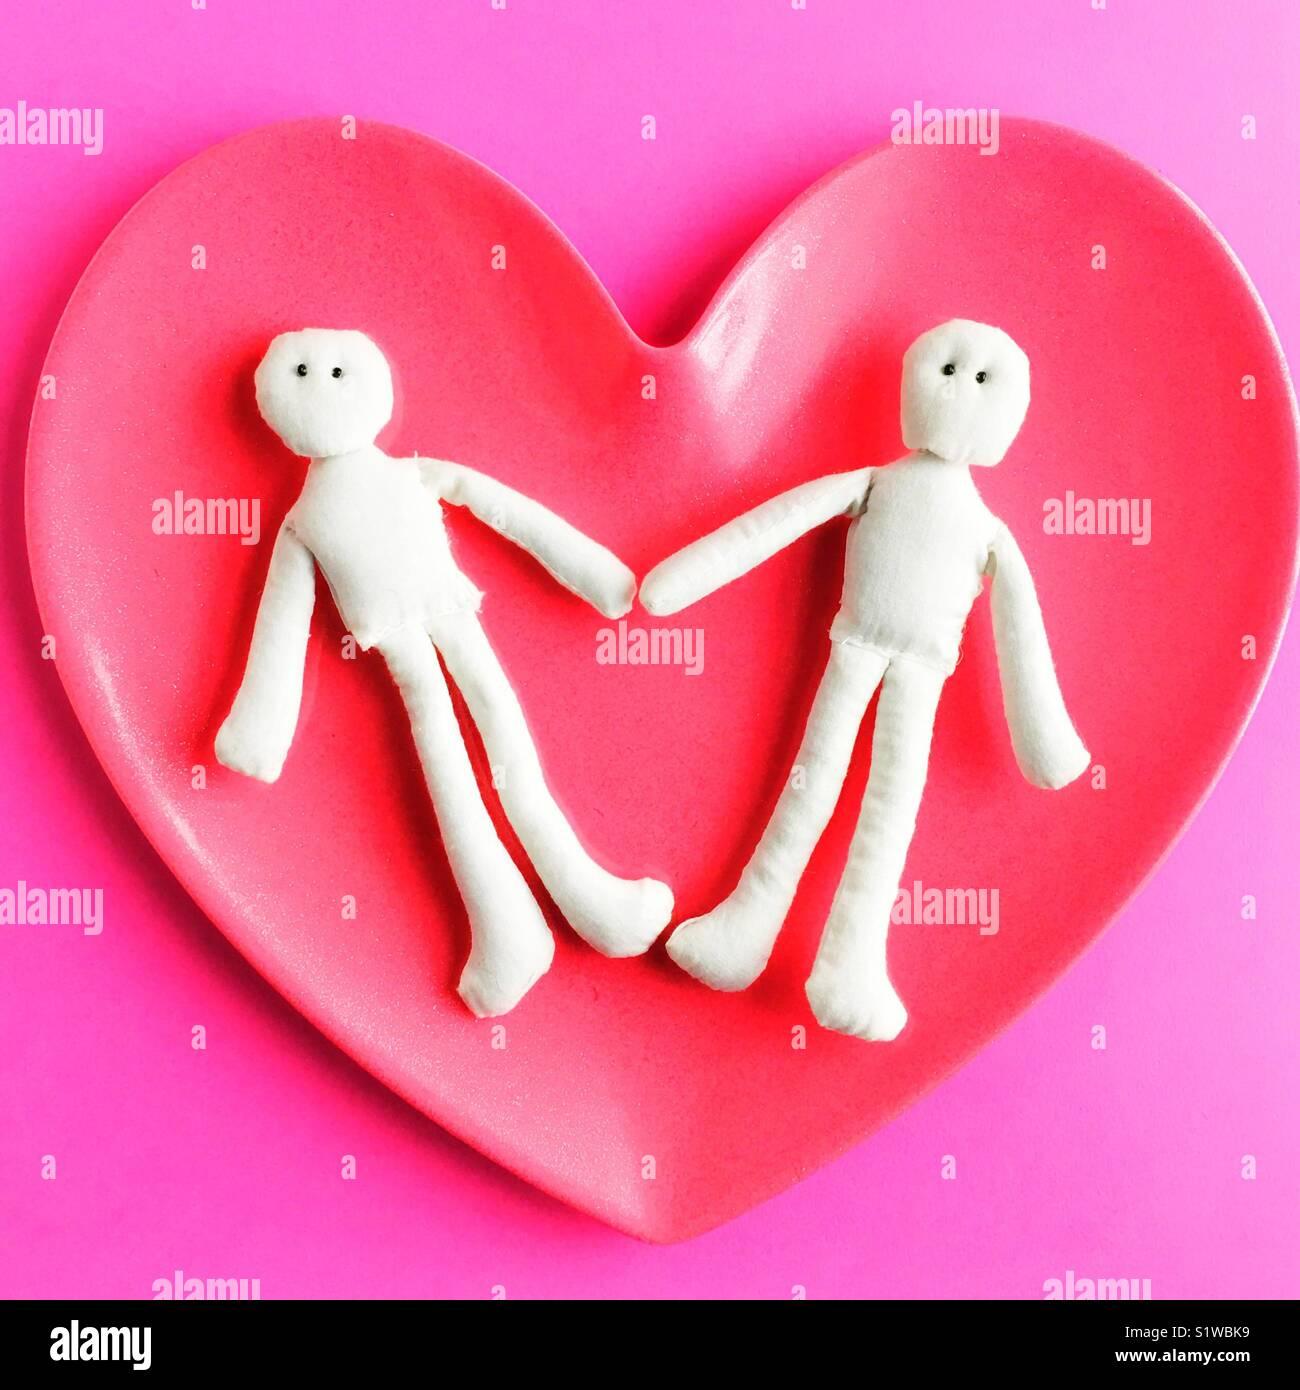 Relación de amor conceptual. Imagen De Stock